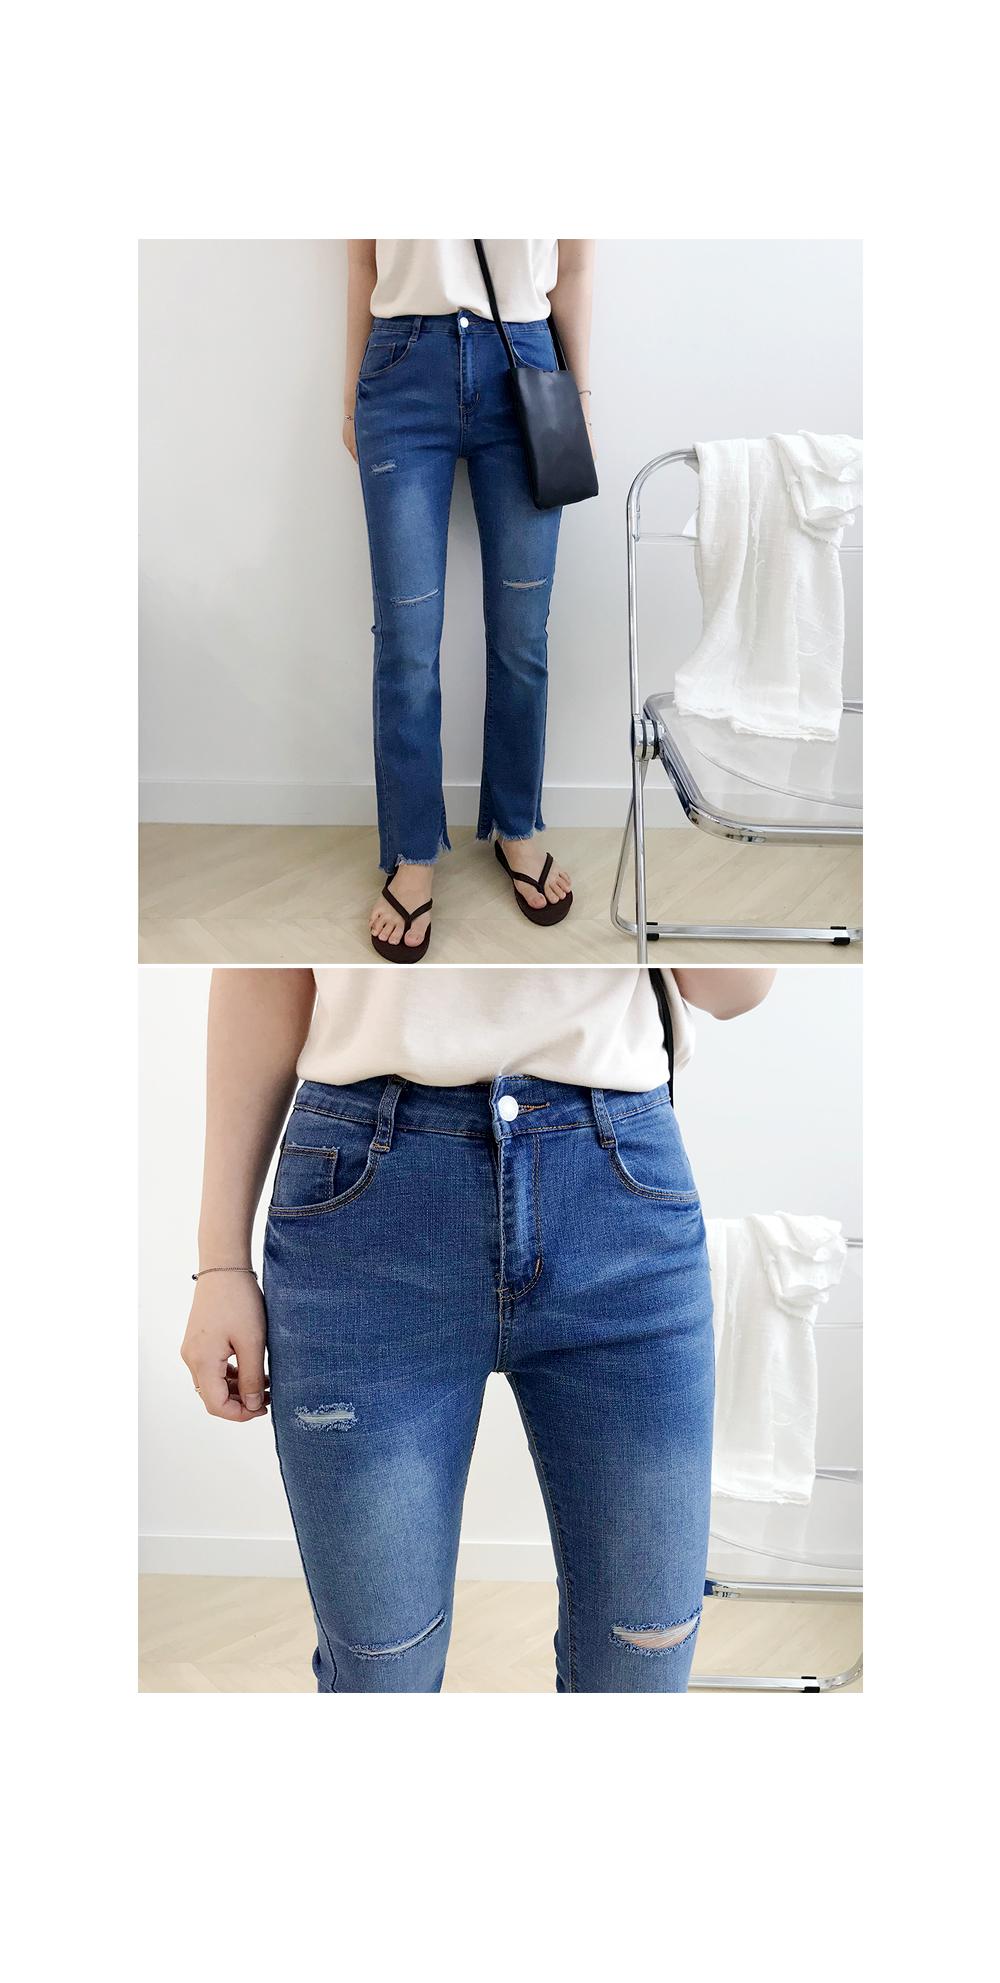 Viol Cut Blue Pants